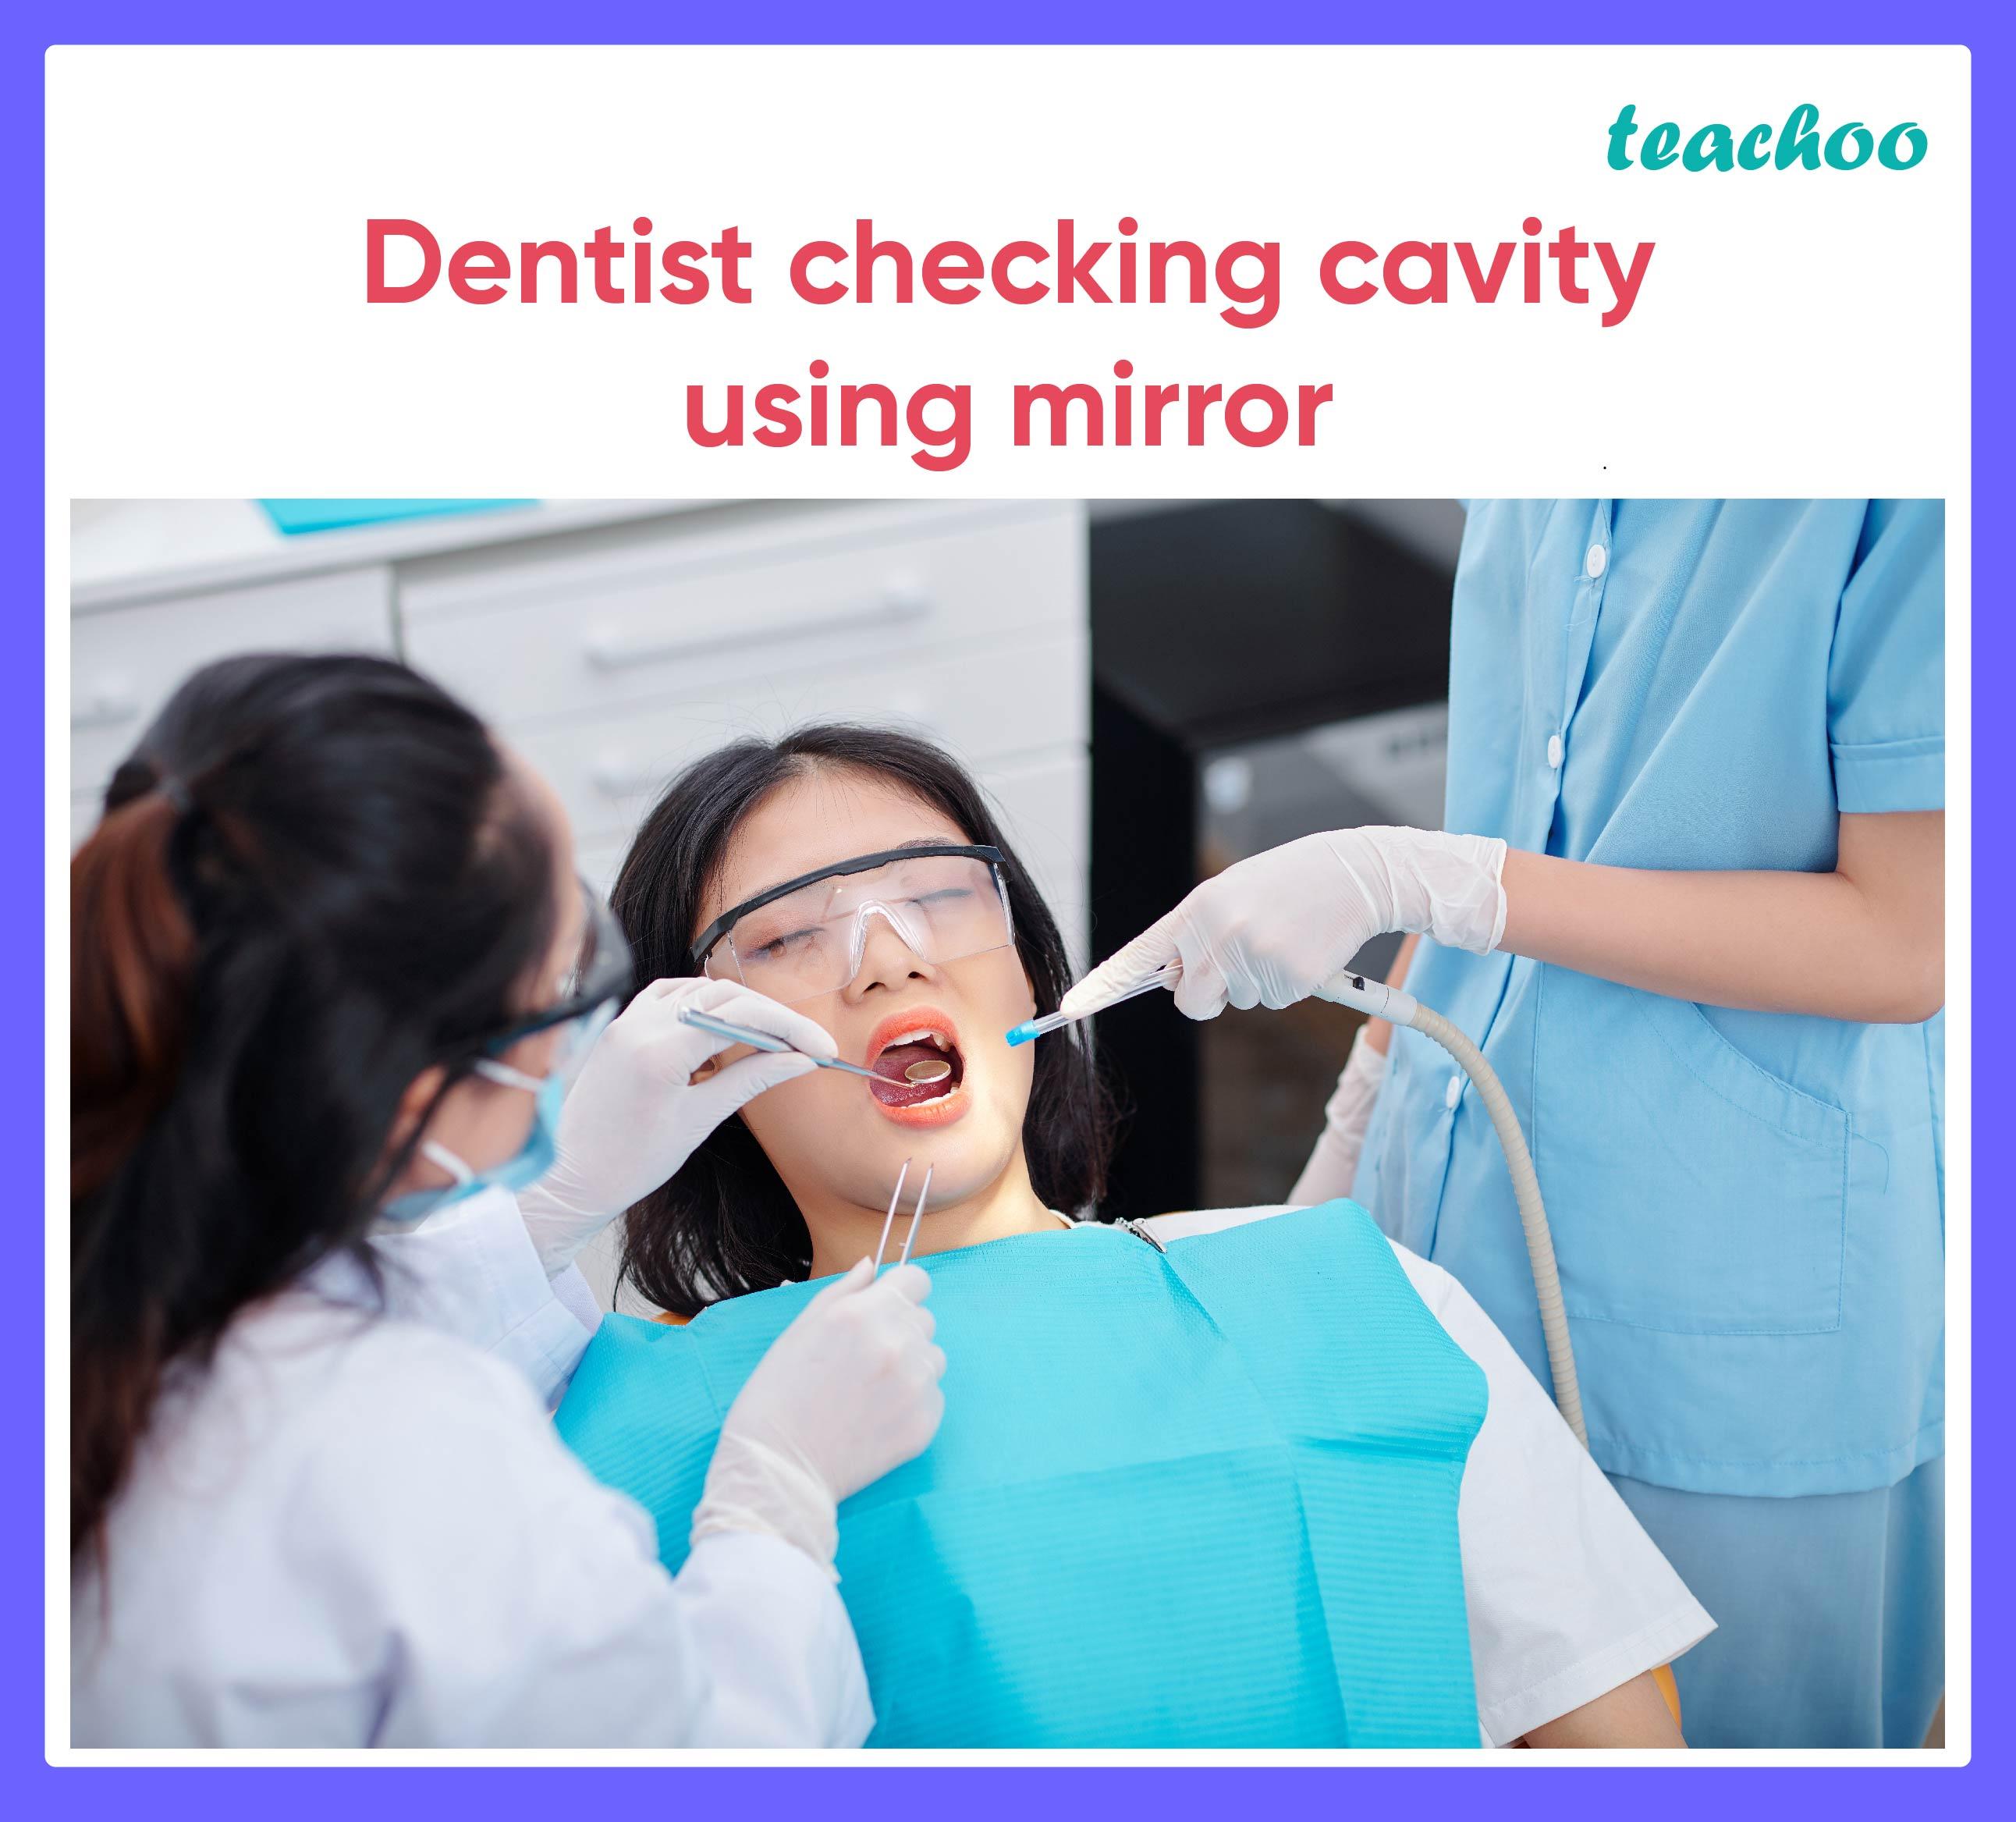 Dentist checking cavity using mirror - Teachoo.jpg